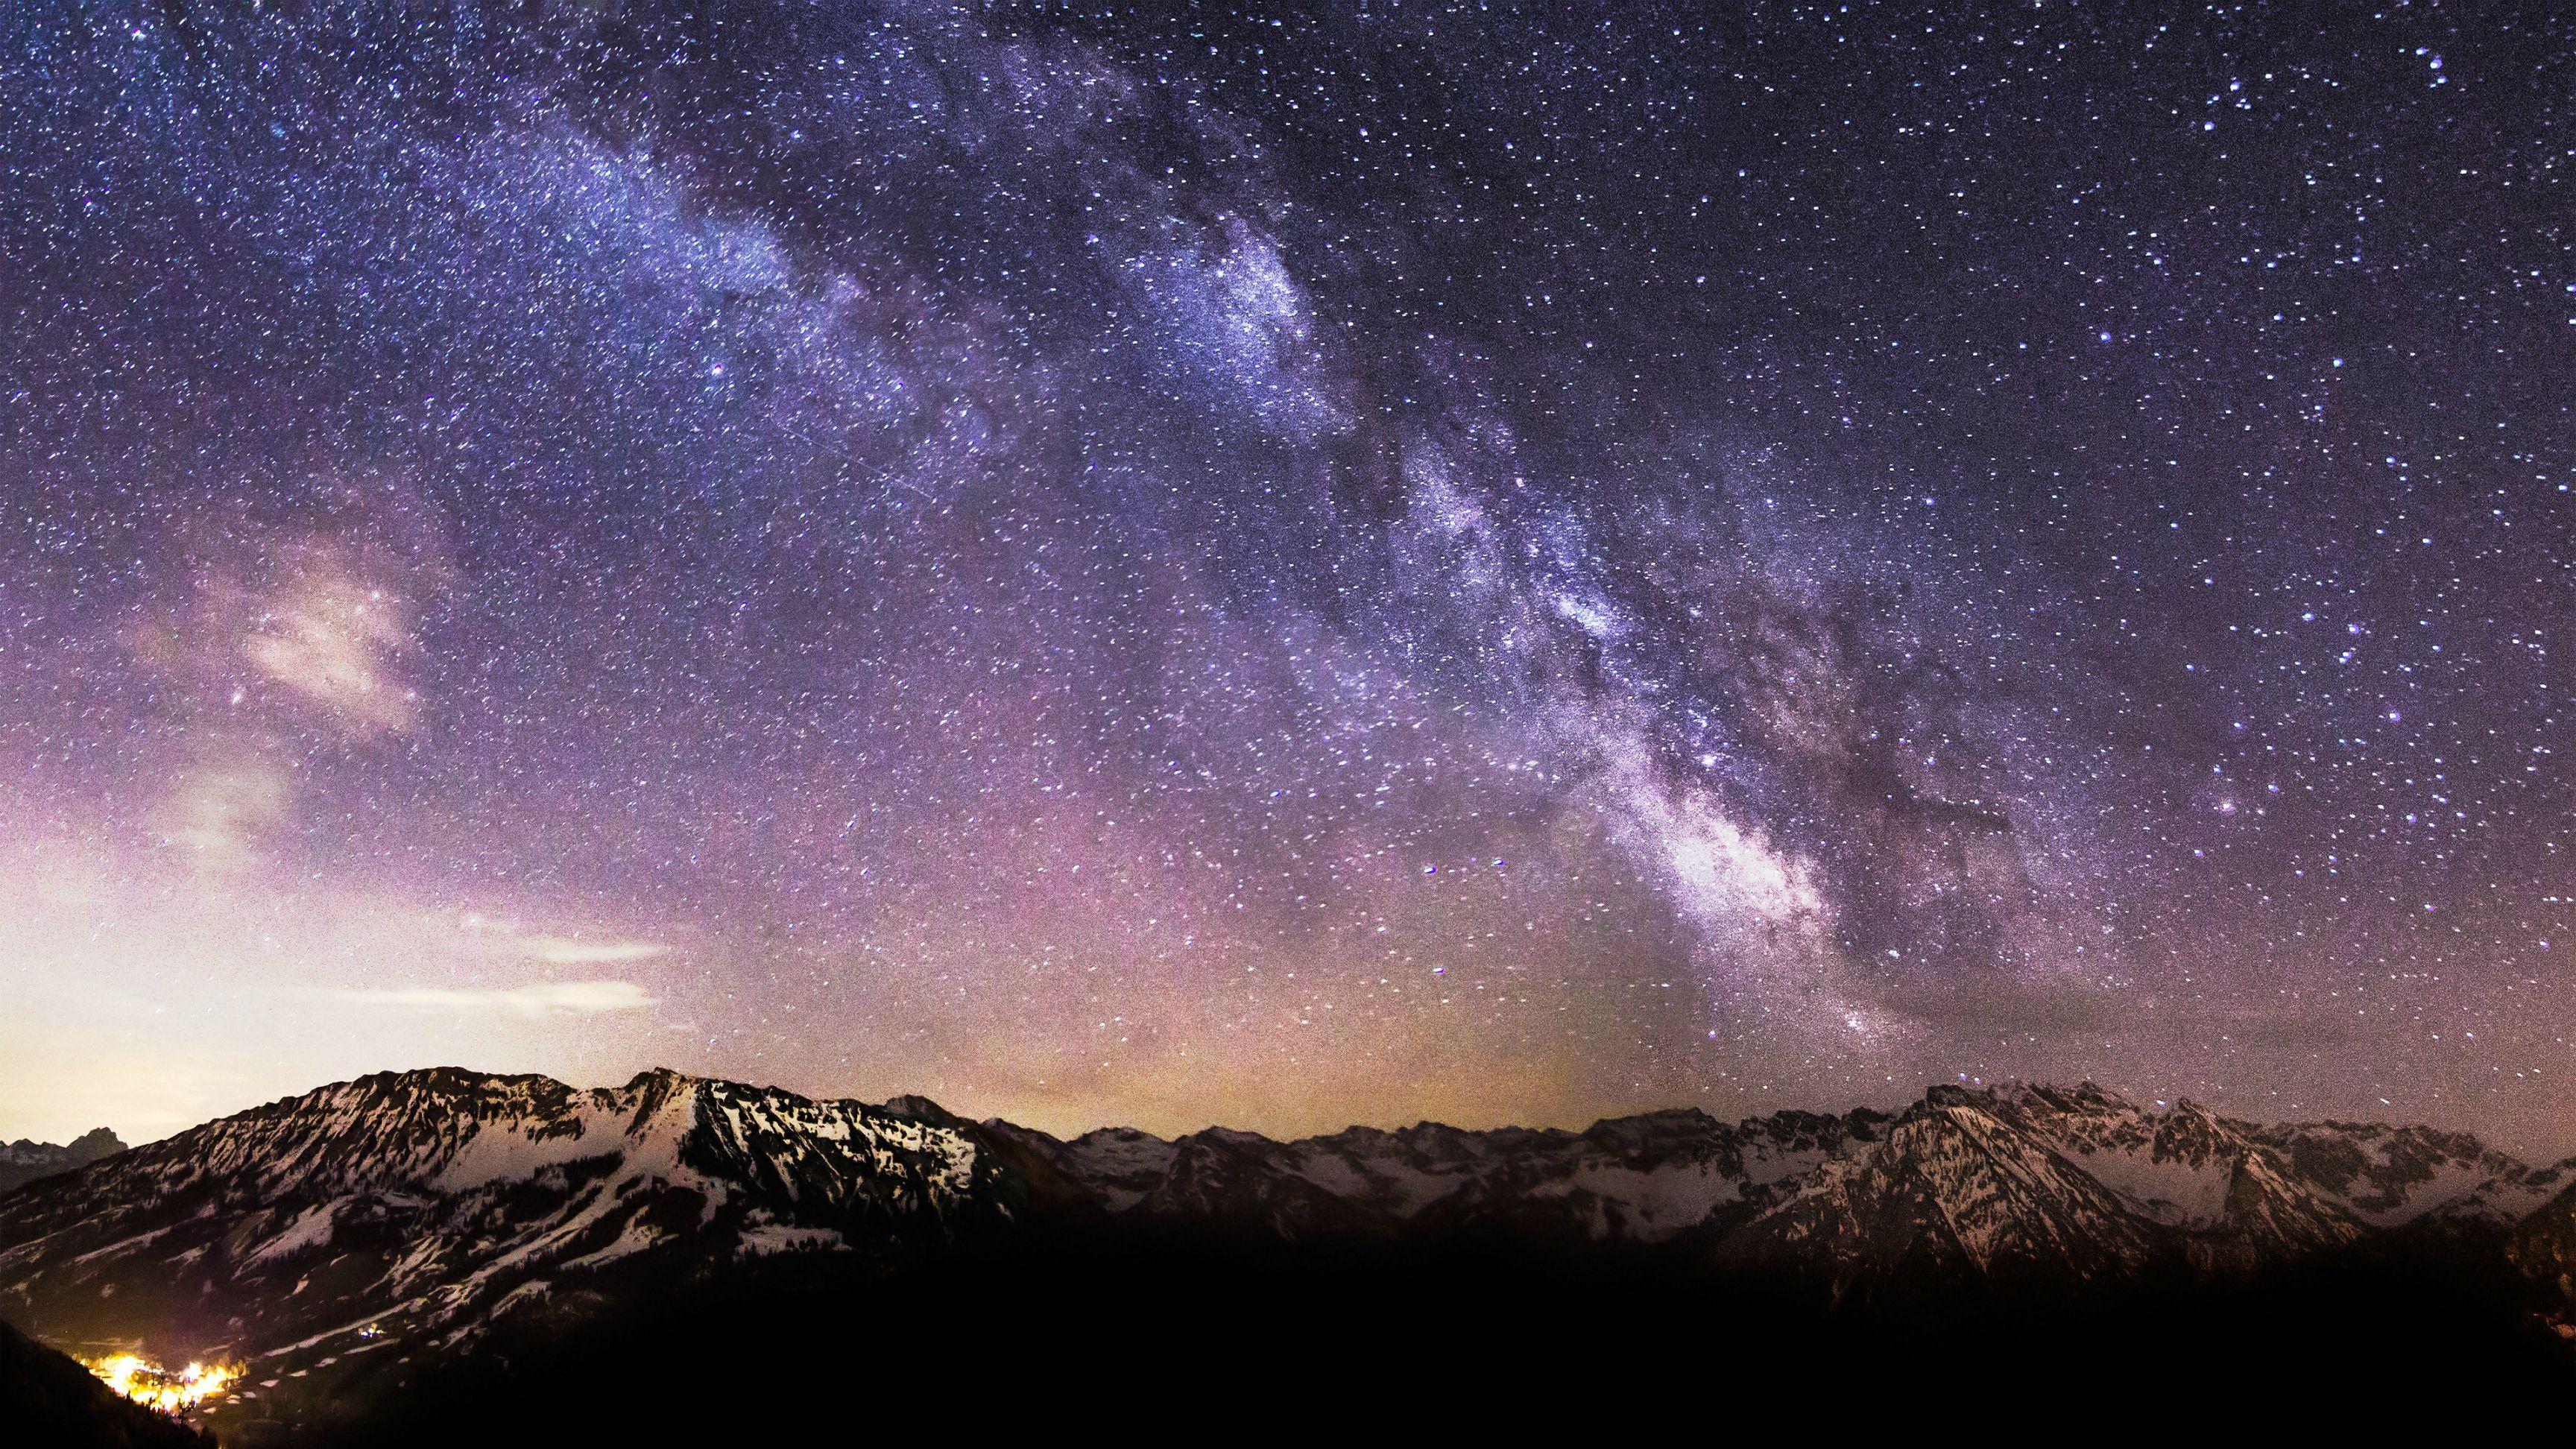 Amazing Milky Way Wallpapers: 4K UHD Wallpapers